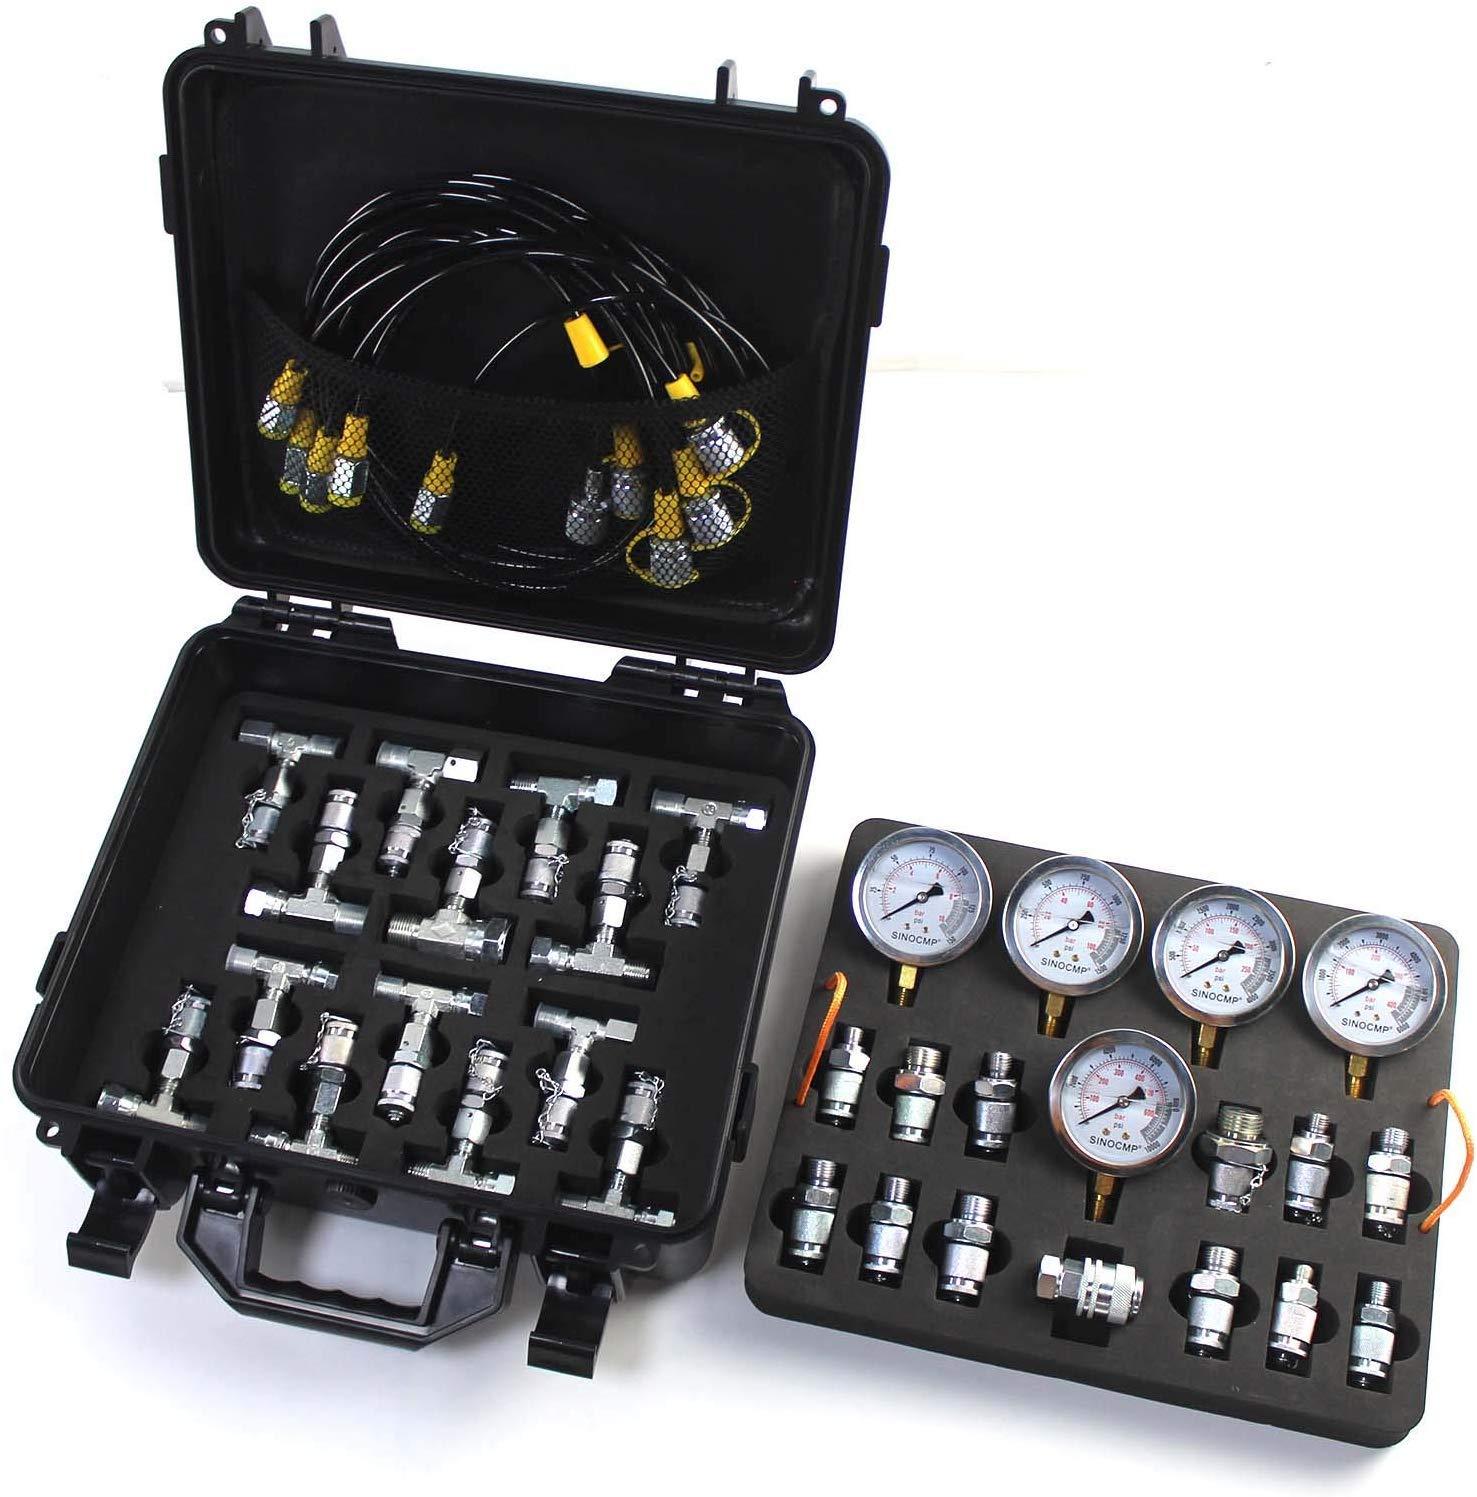 SINOCMP High order Hydraulic Pressure Test Kit Gauges 5 Weekly update Hoses with